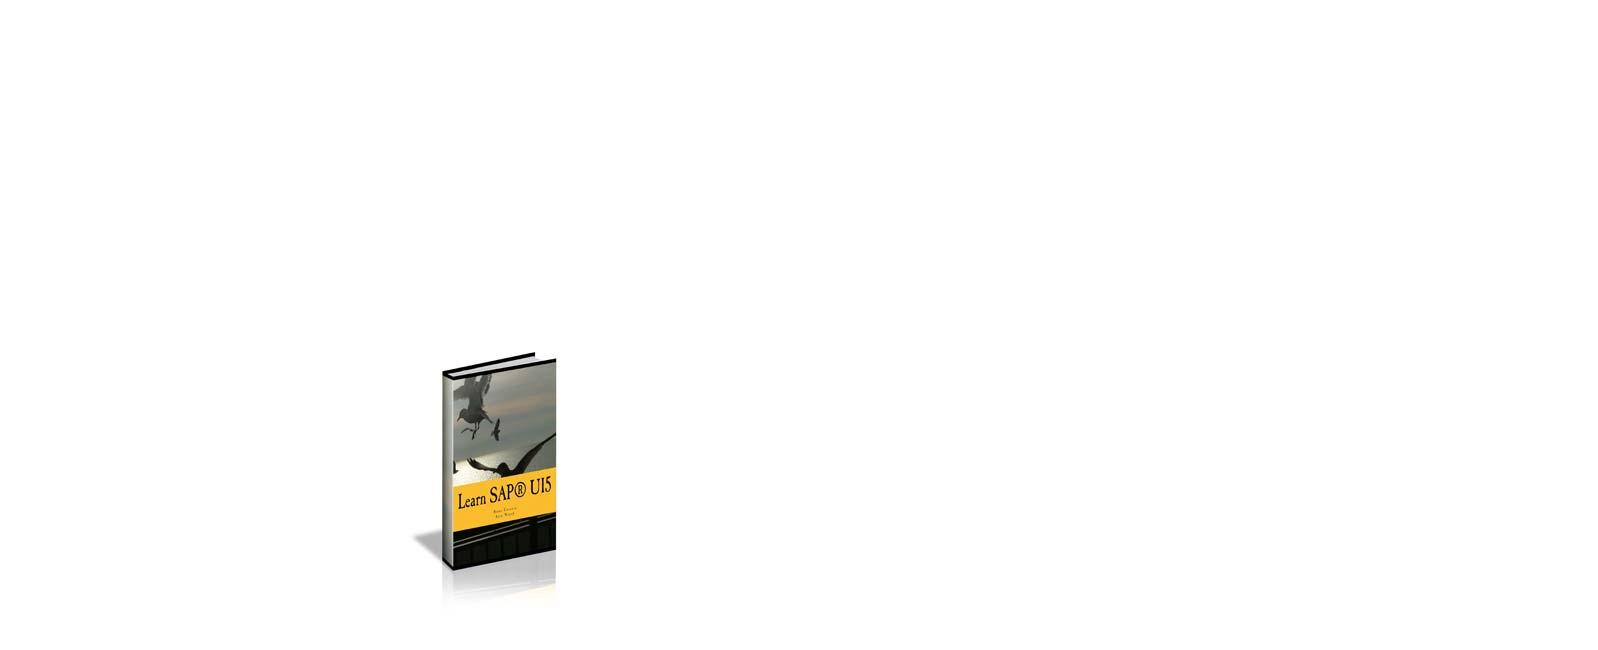 Learn sap ui5 professional development e book learn sap ui5 professional development e book fandeluxe Image collections